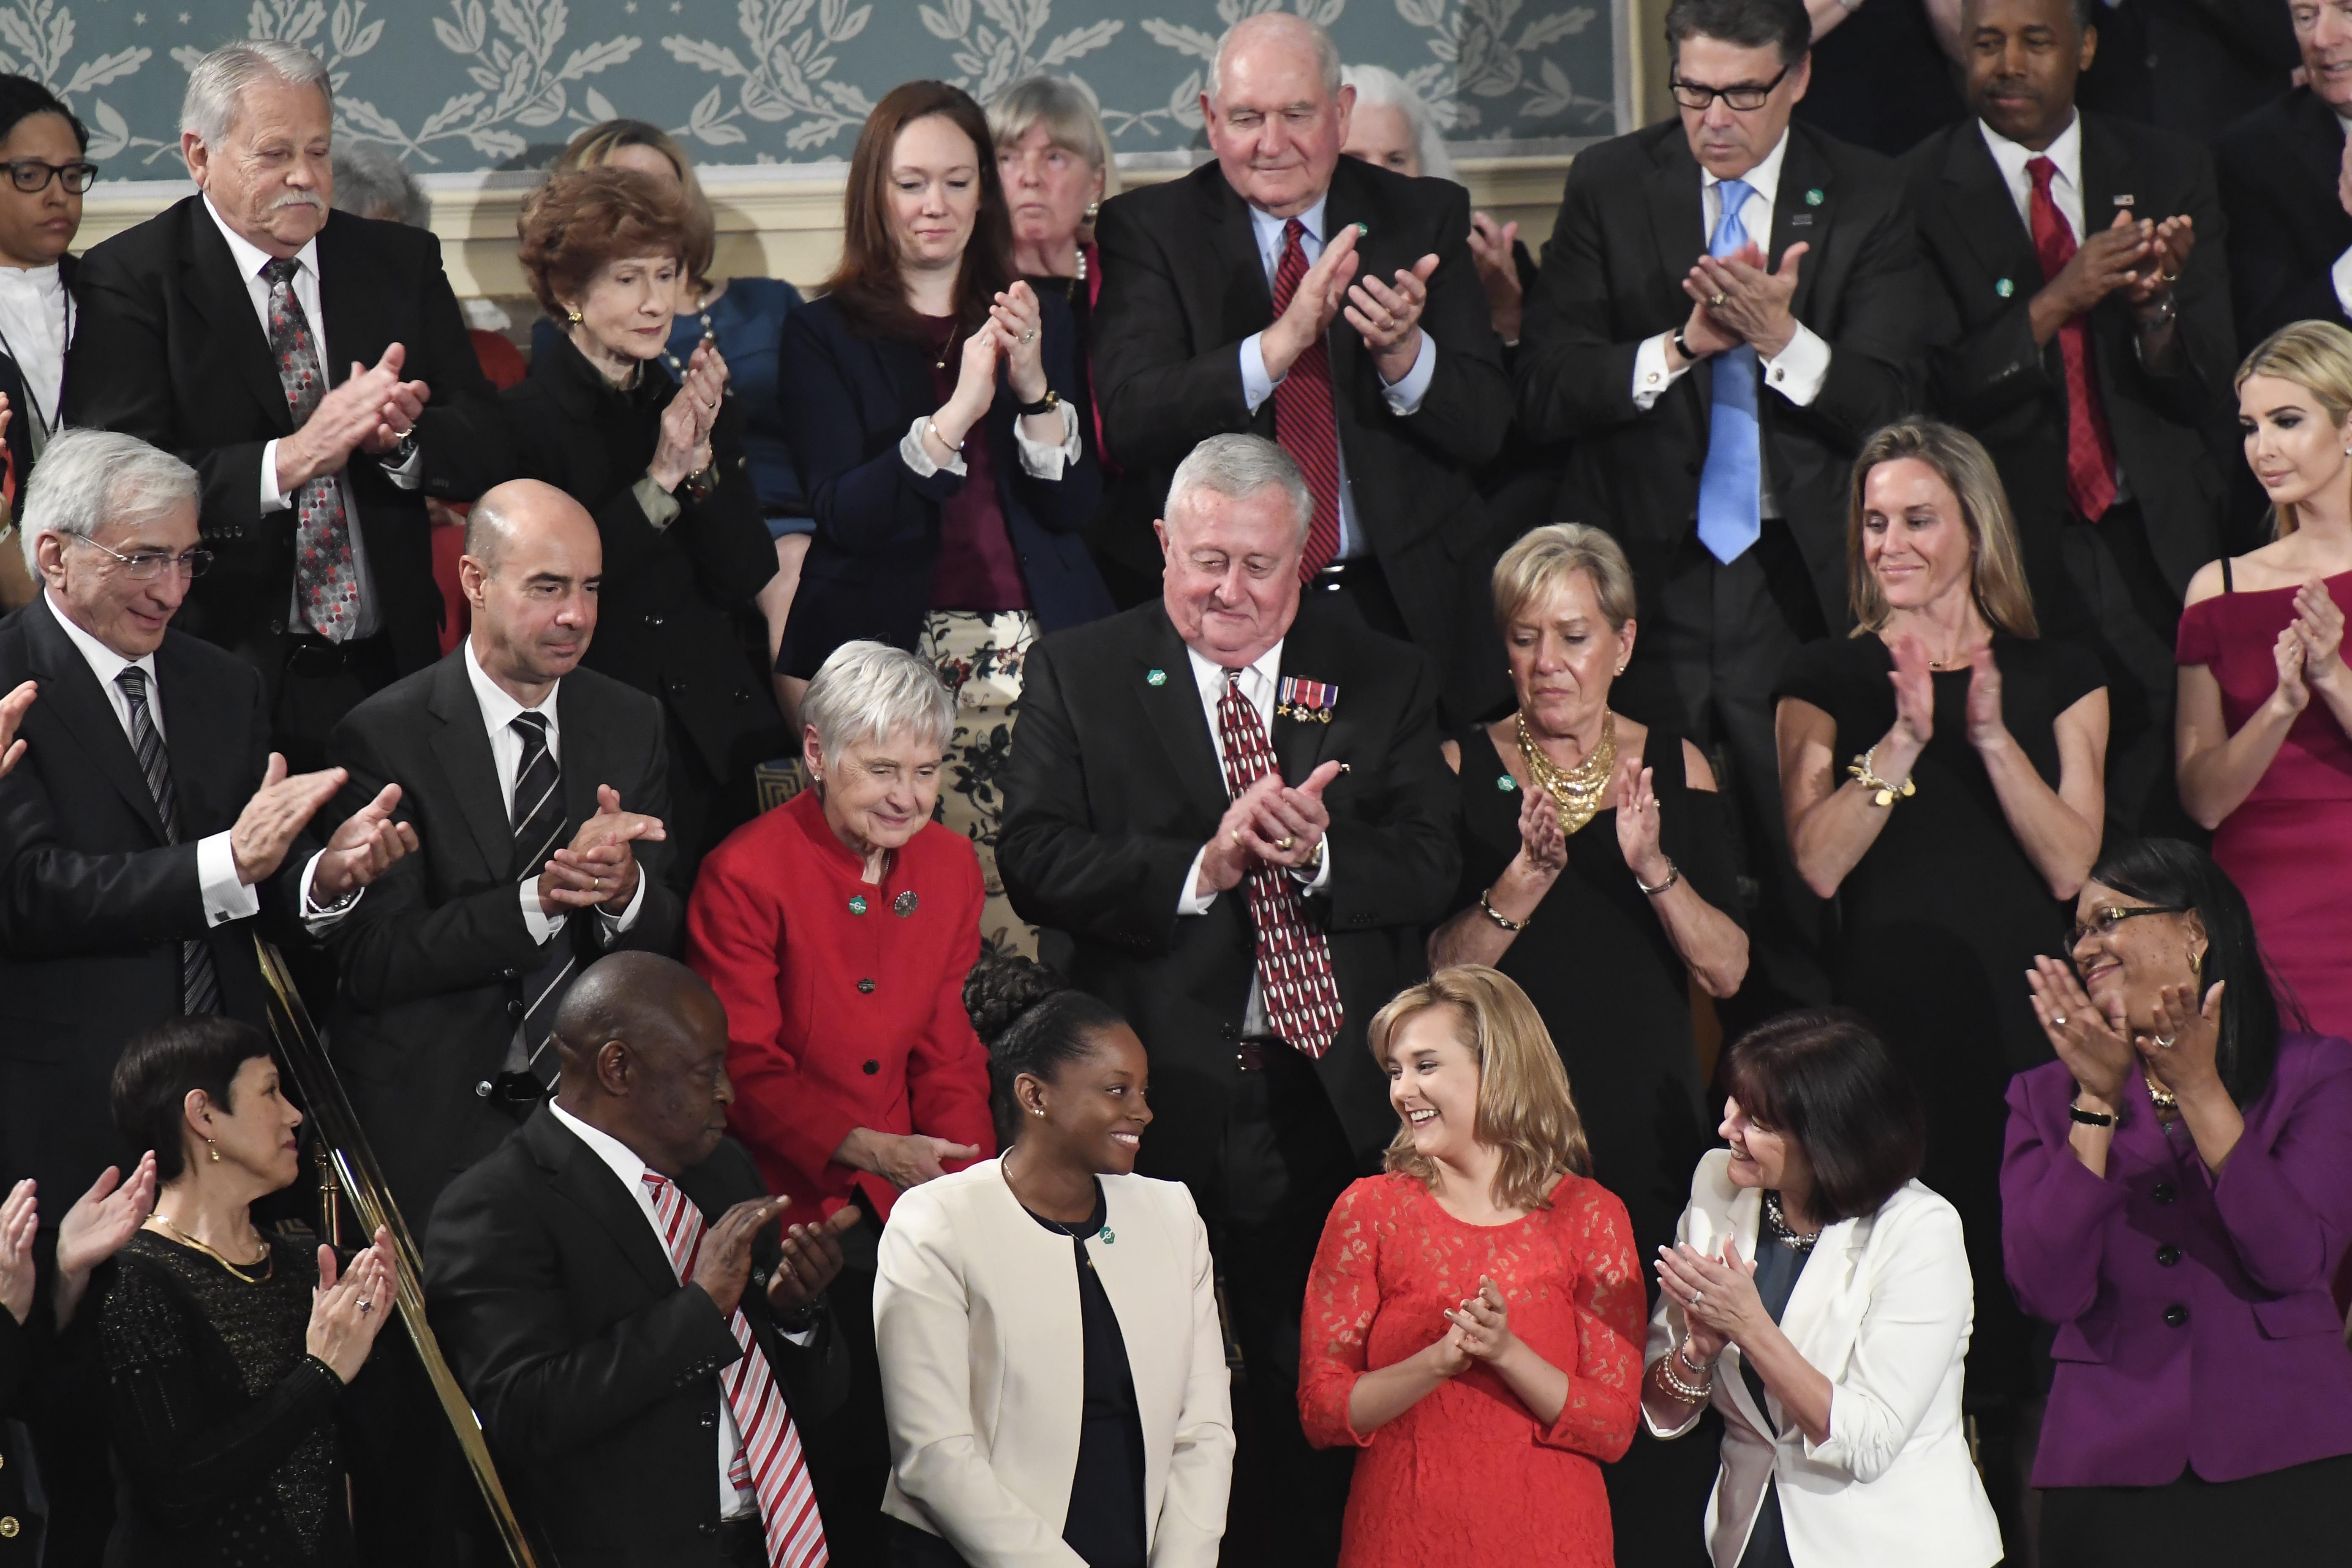 WASHINGTON, DC - FEBRUARY 28: People applaud Denisha Merriweath